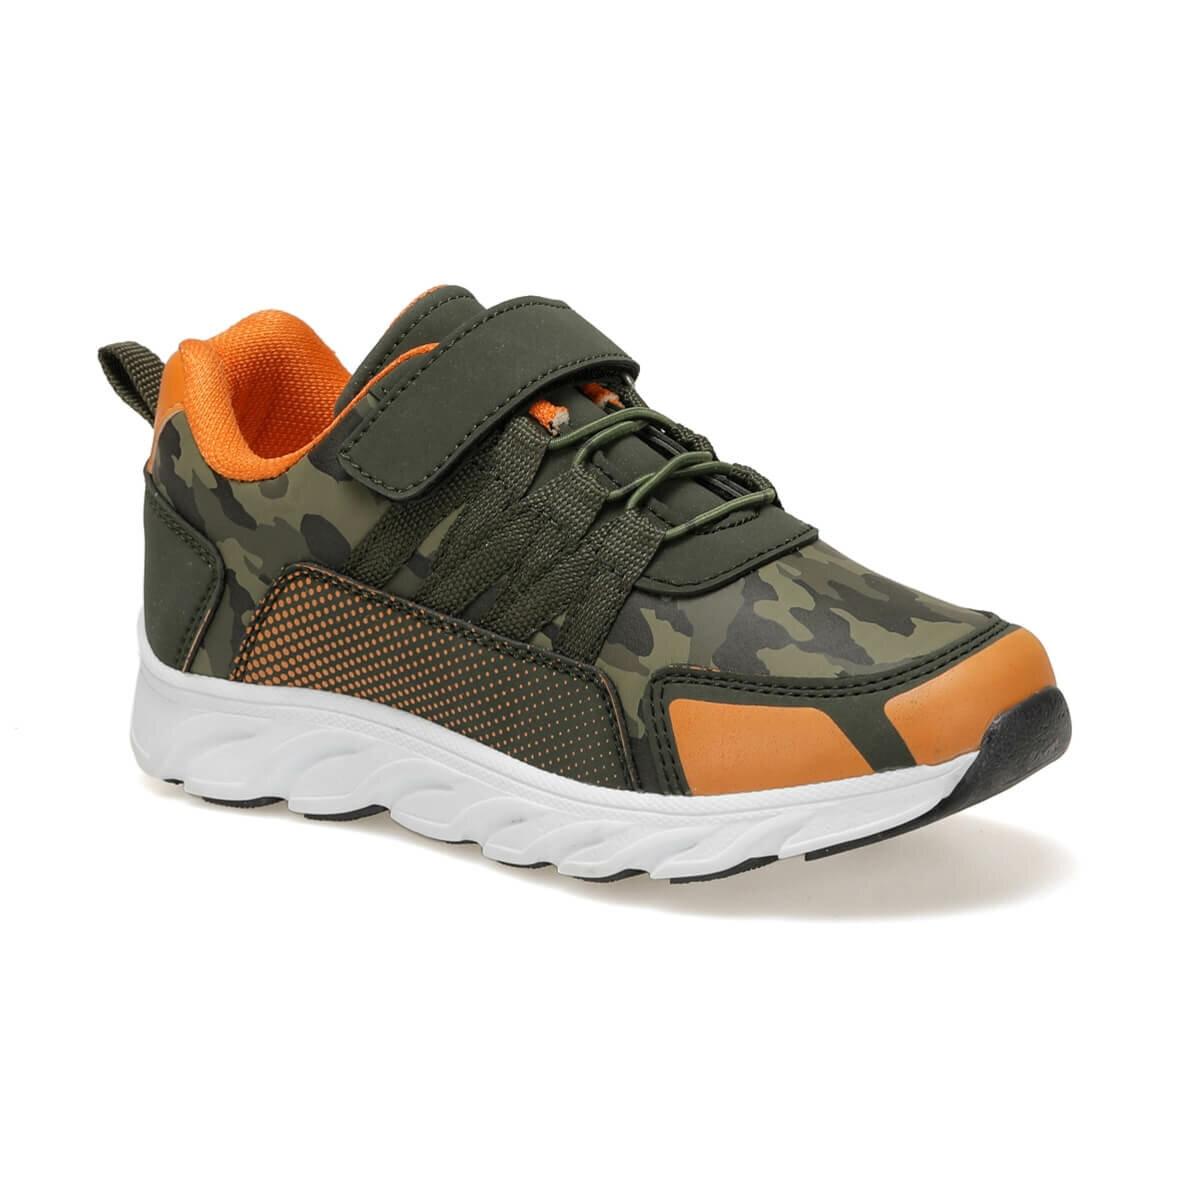 FLO MIRIN Khaki Male Child Hiking Shoes I-Cool